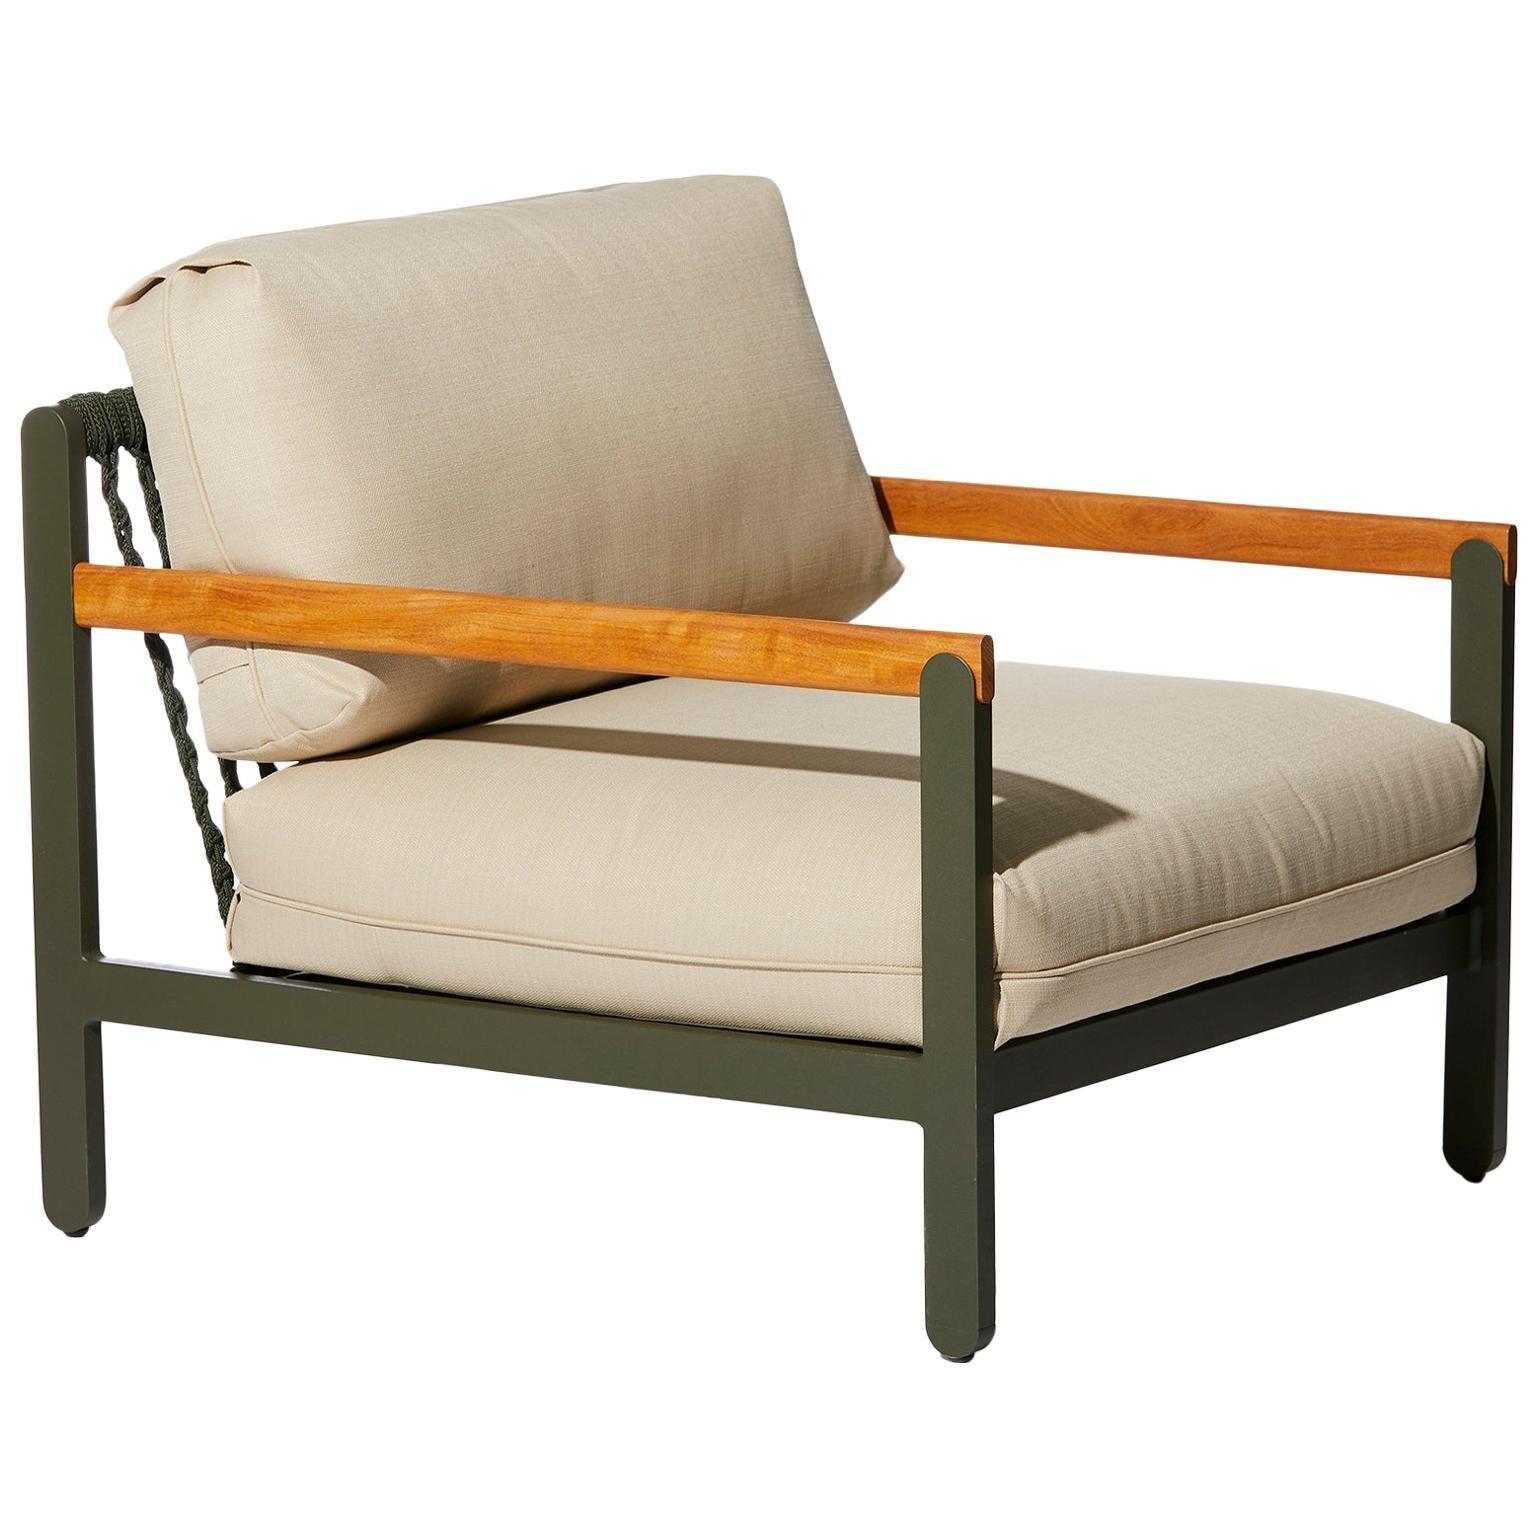 Lounge Style Minimalist Armchair, Indoor or Outdoor, Hardwood, Metal and Rope